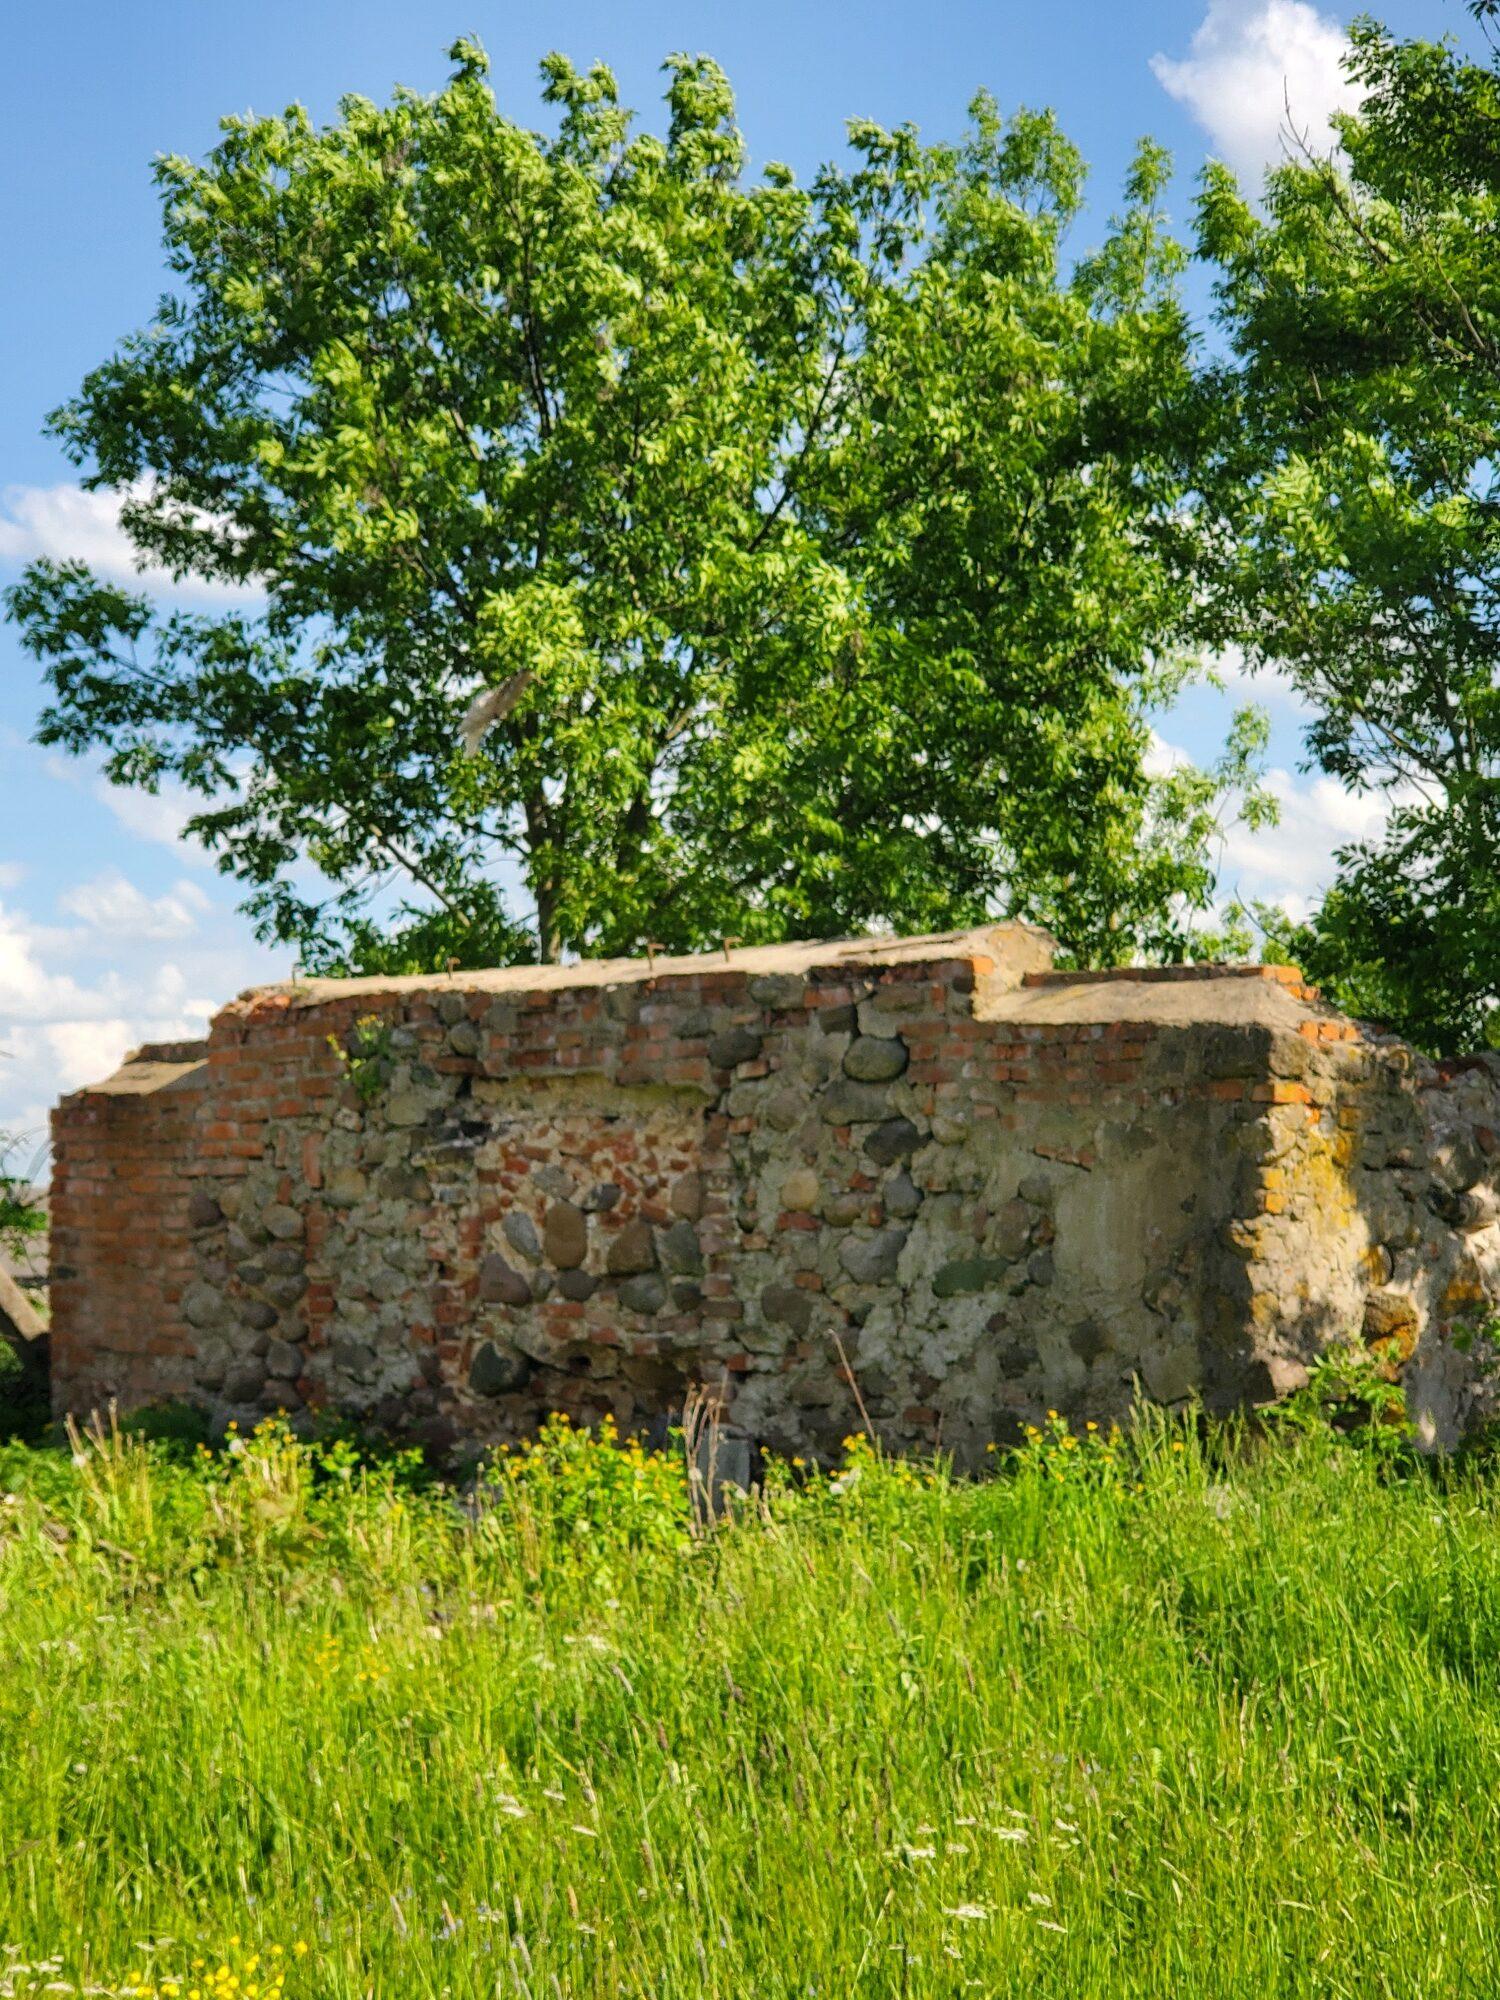 20200606 163532 rotated - Церковь Святого Георгия Победоносца в Ситцах